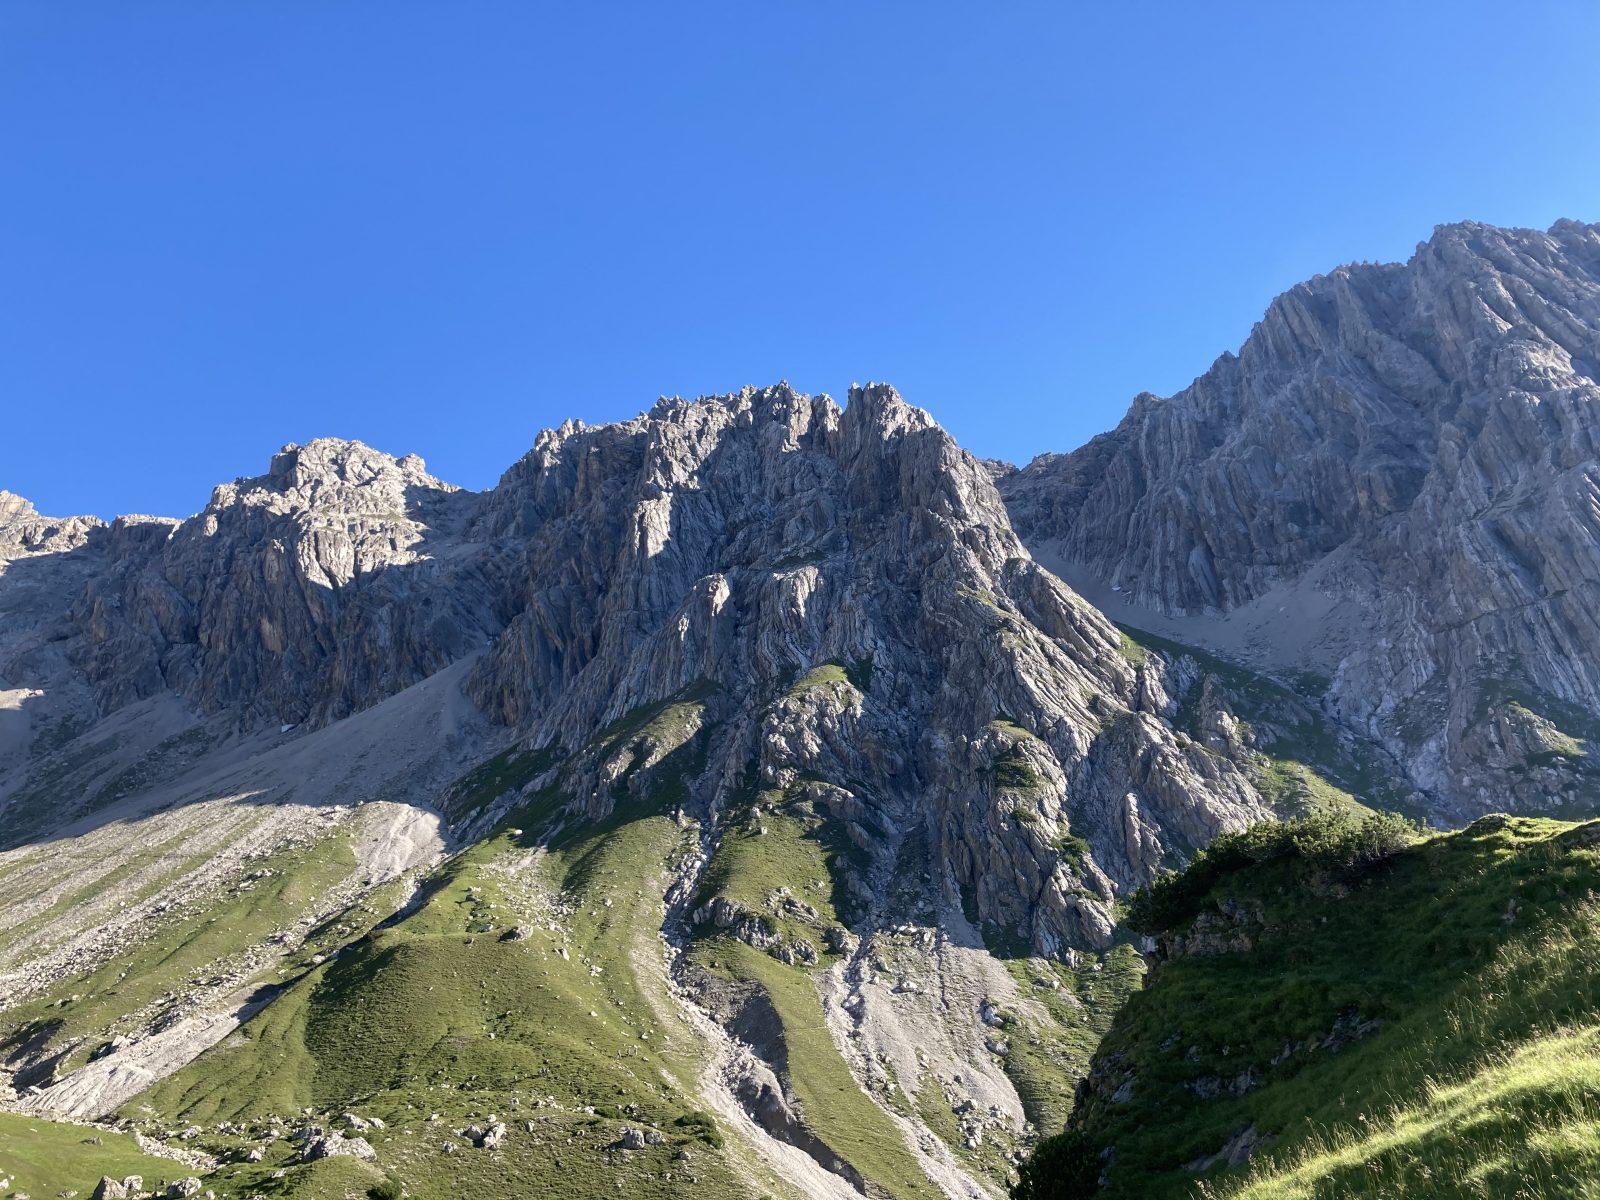 Maldonkopf rechts, Scharnitzköpfe links, Foto: Susa Schreiner |Climbers Paradise